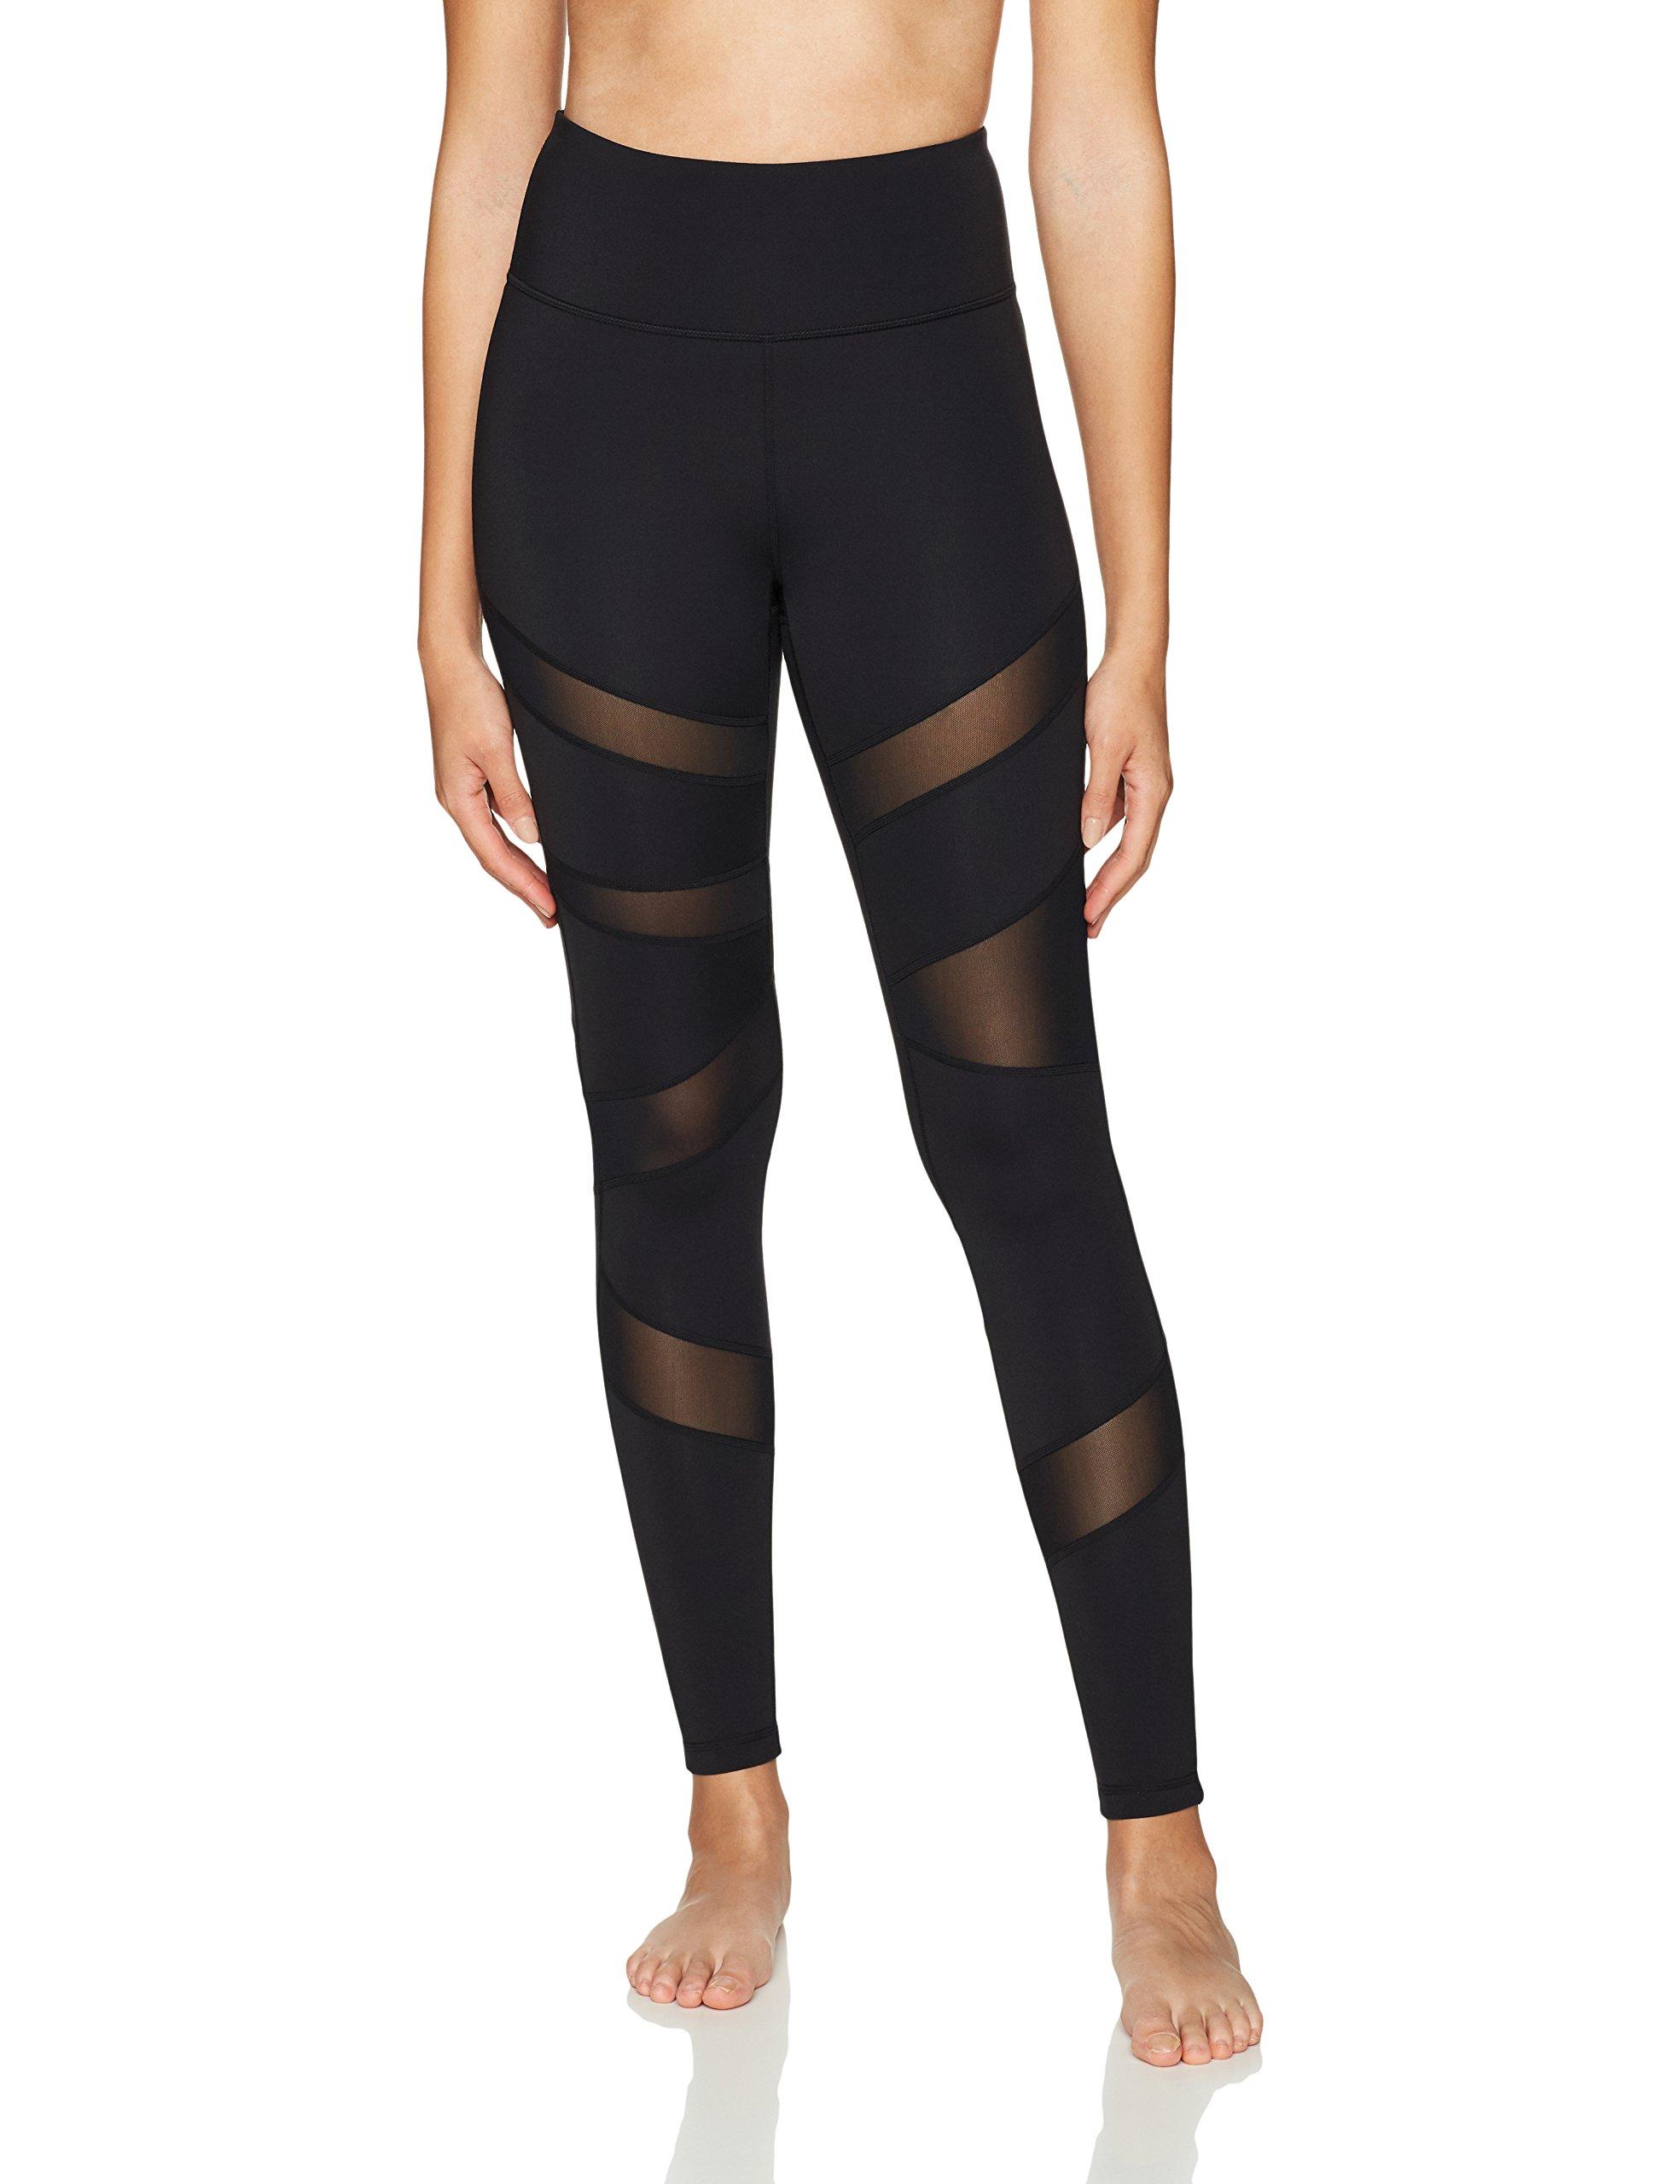 Legging En FemmeNoirblack Core SeriesThe ShineMedium 10 Maille black Icon Warrior WHeYE9ID2